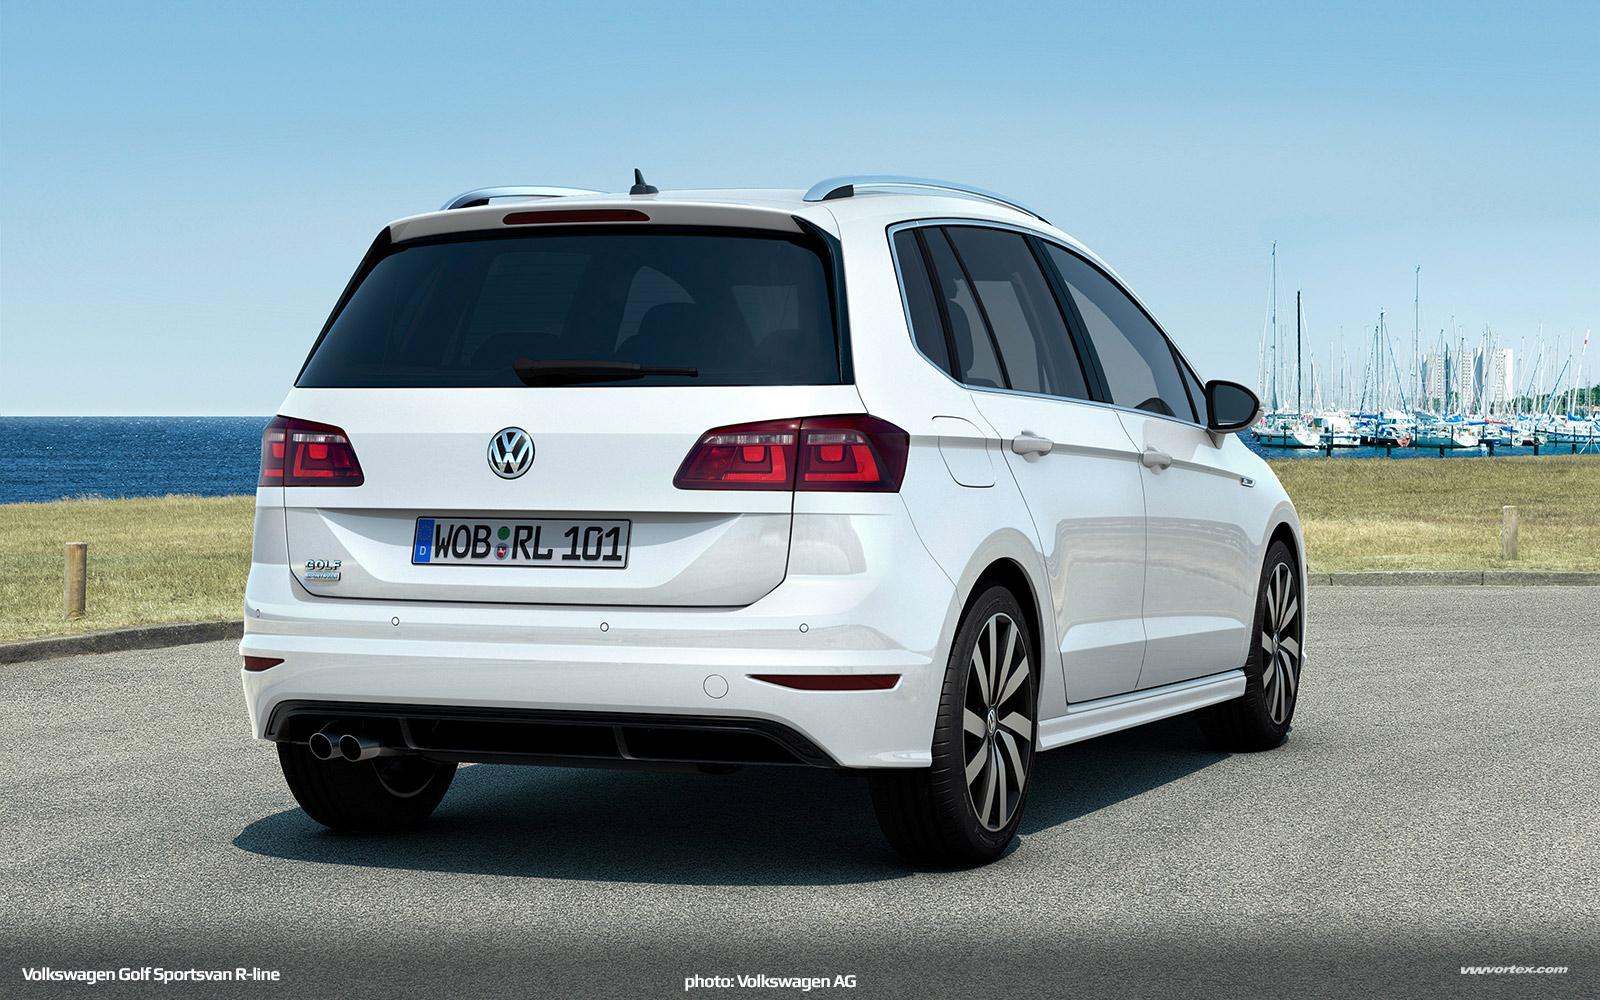 Volkswagen-Golf-Sportsvan-R-line-2015-426